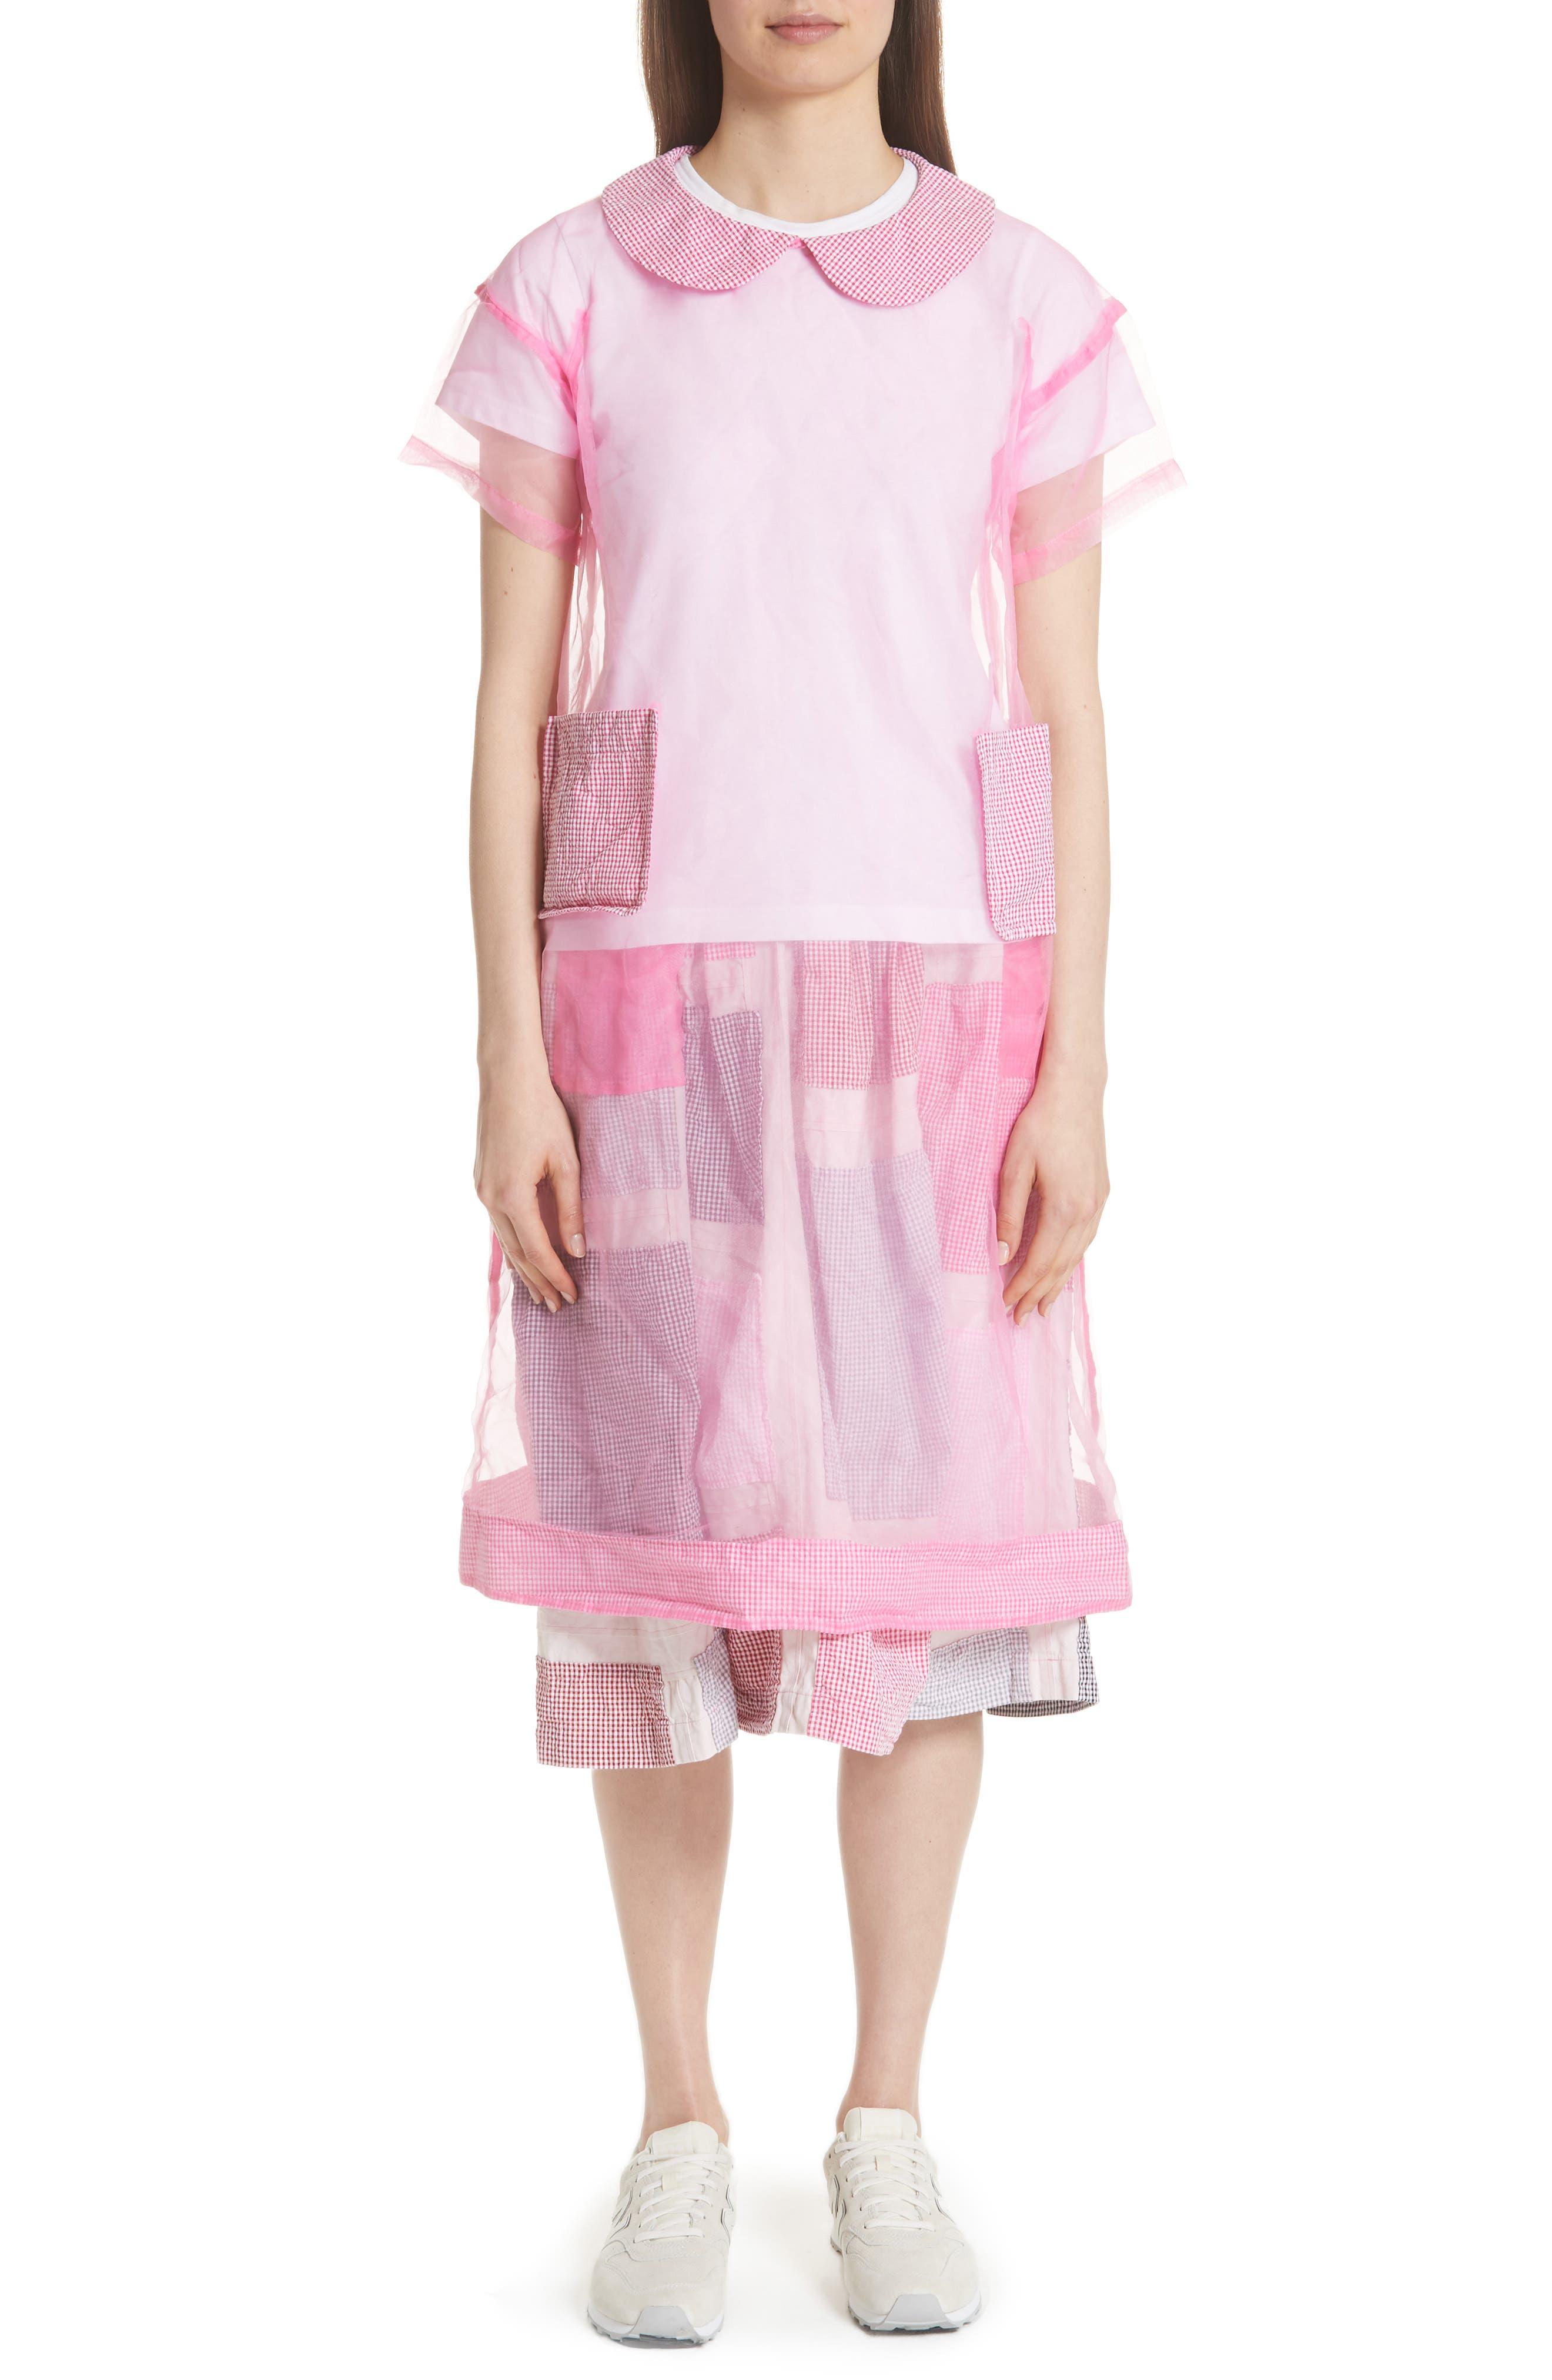 TRICOT COMME DES GARCONS SHEER GINGHAM TRIM SHIFT DRESS